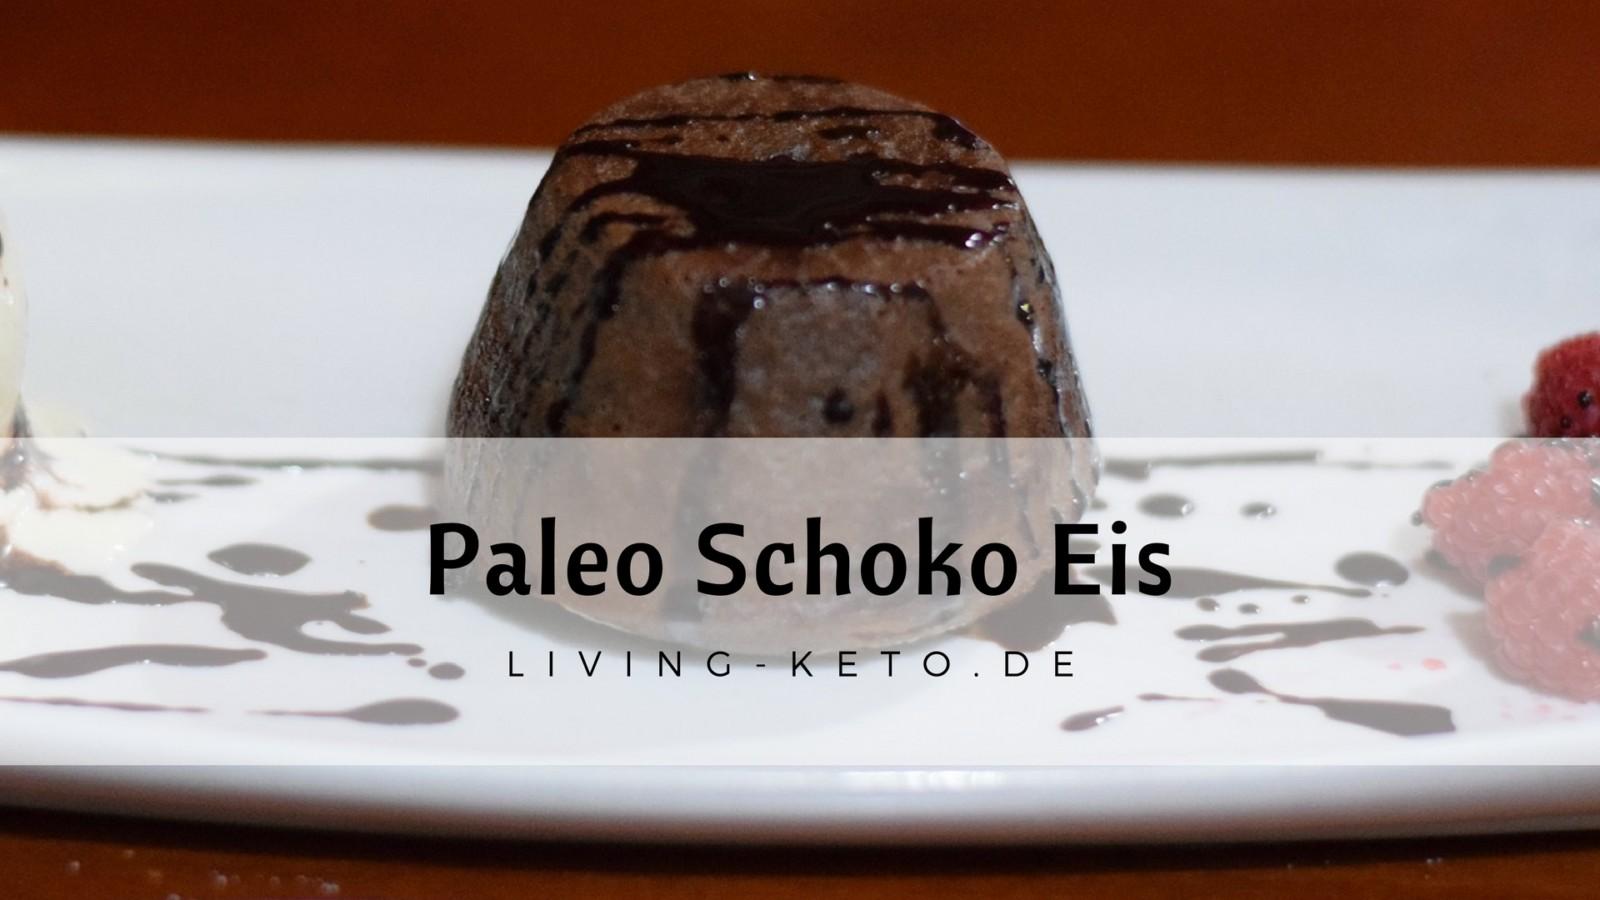 Paleo Schoko-Eis